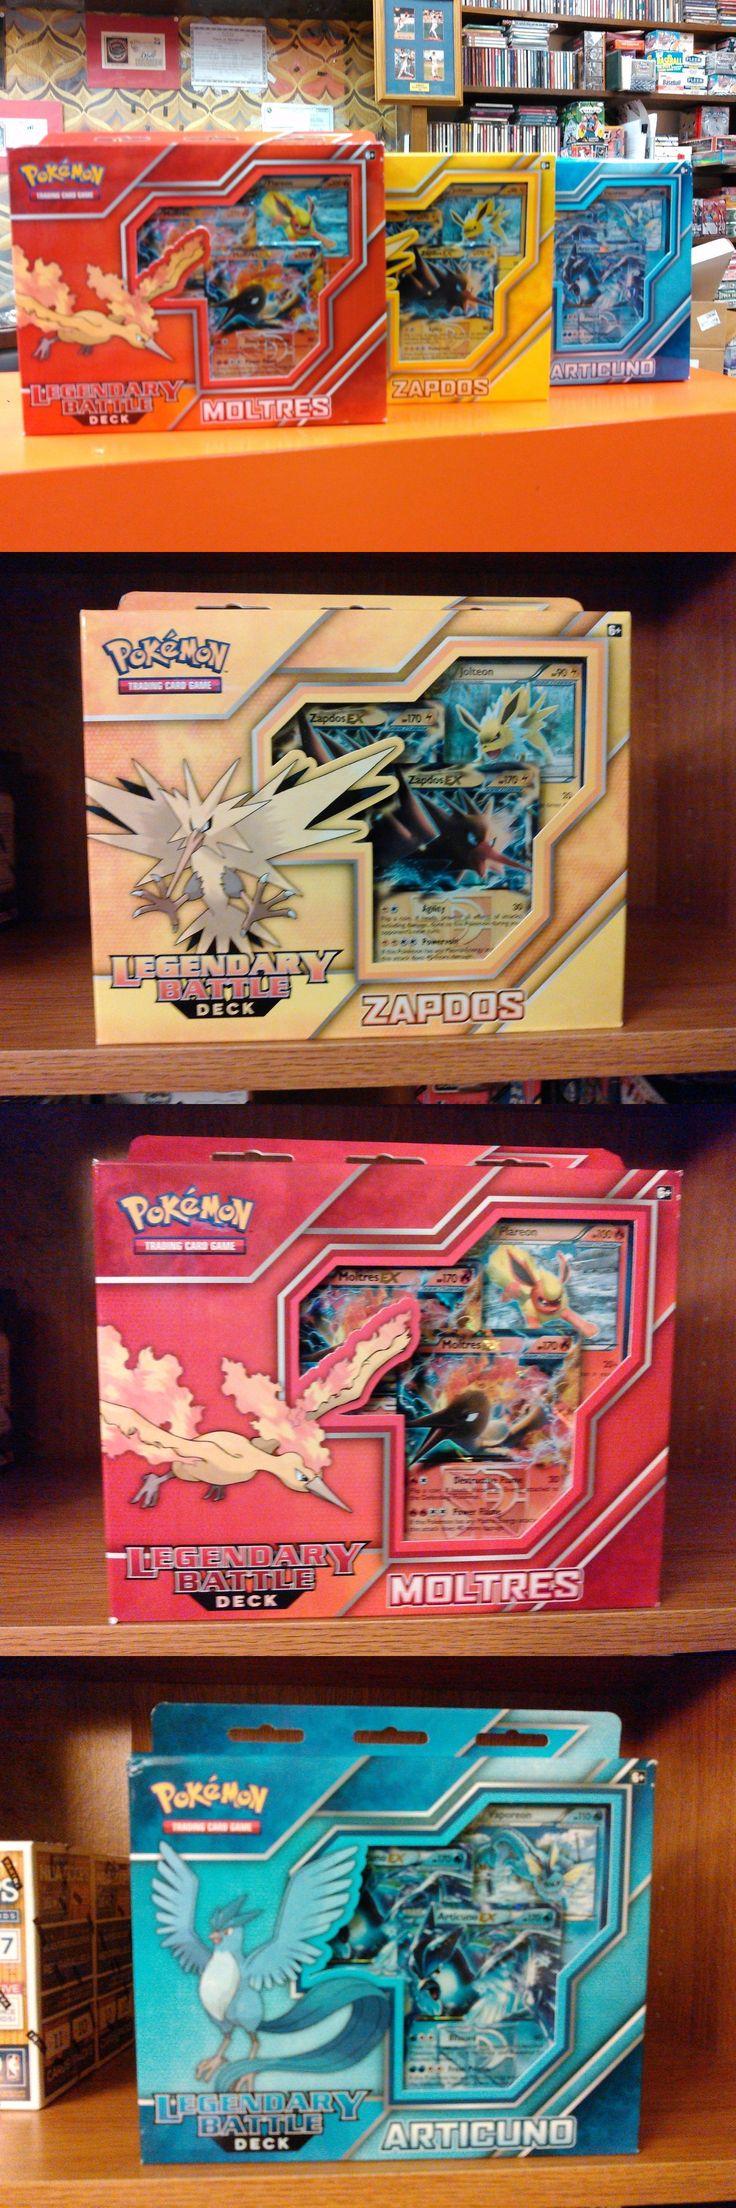 Pok mon Sealed Decks and Kits 183467: Lot Of (3) Pokemon Legendary Battle Decks Zapdos Articuno Moltres Box (3) Boxes -> BUY IT NOW ONLY: $49 on eBay!